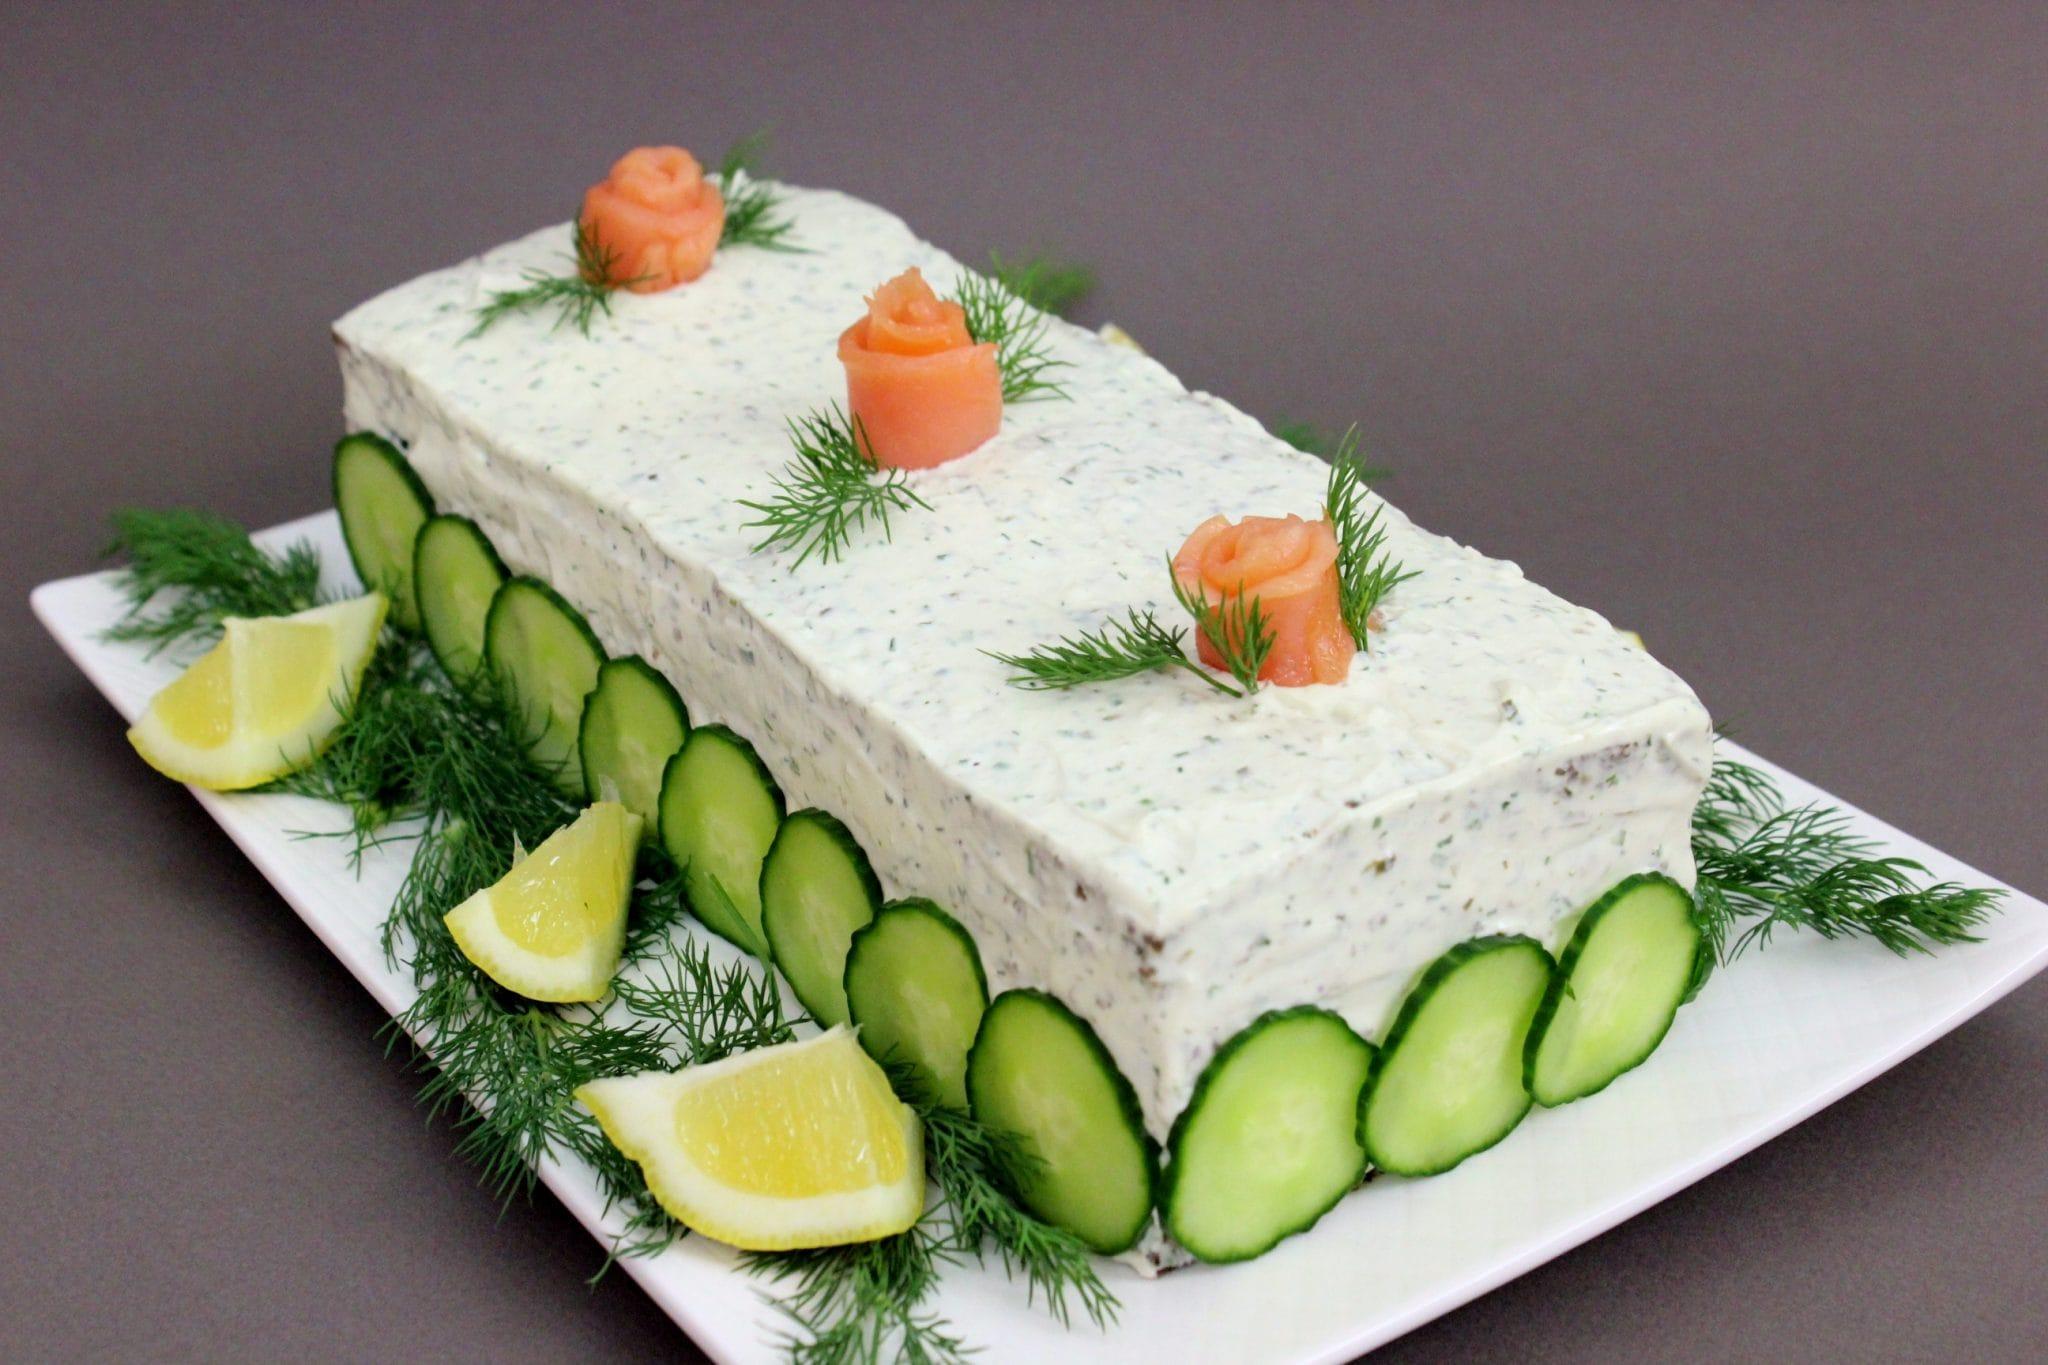 Smoked Salmon Cake - Olga's Flavor Factory